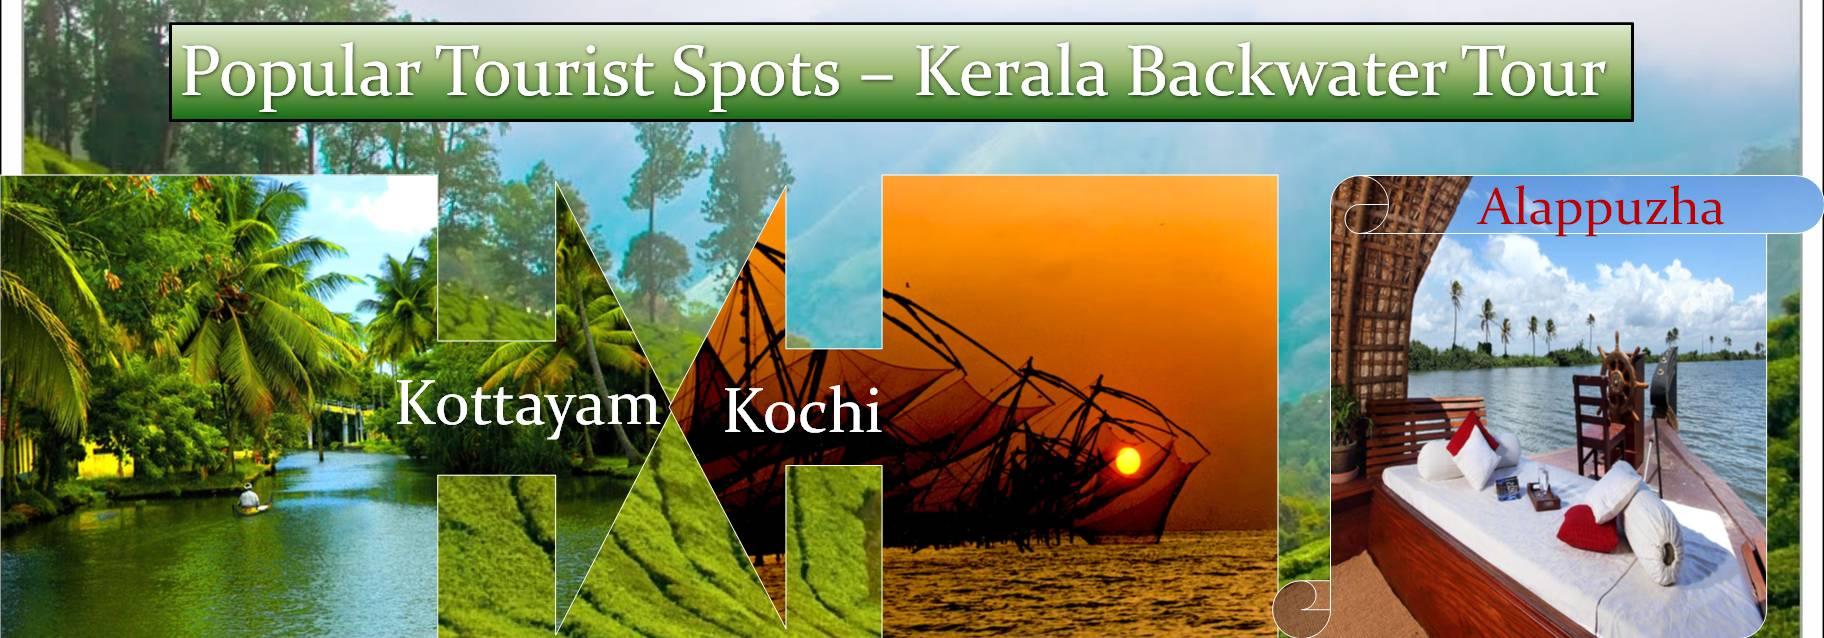 Popular Tourist Spots - Kerala Backwater Tour